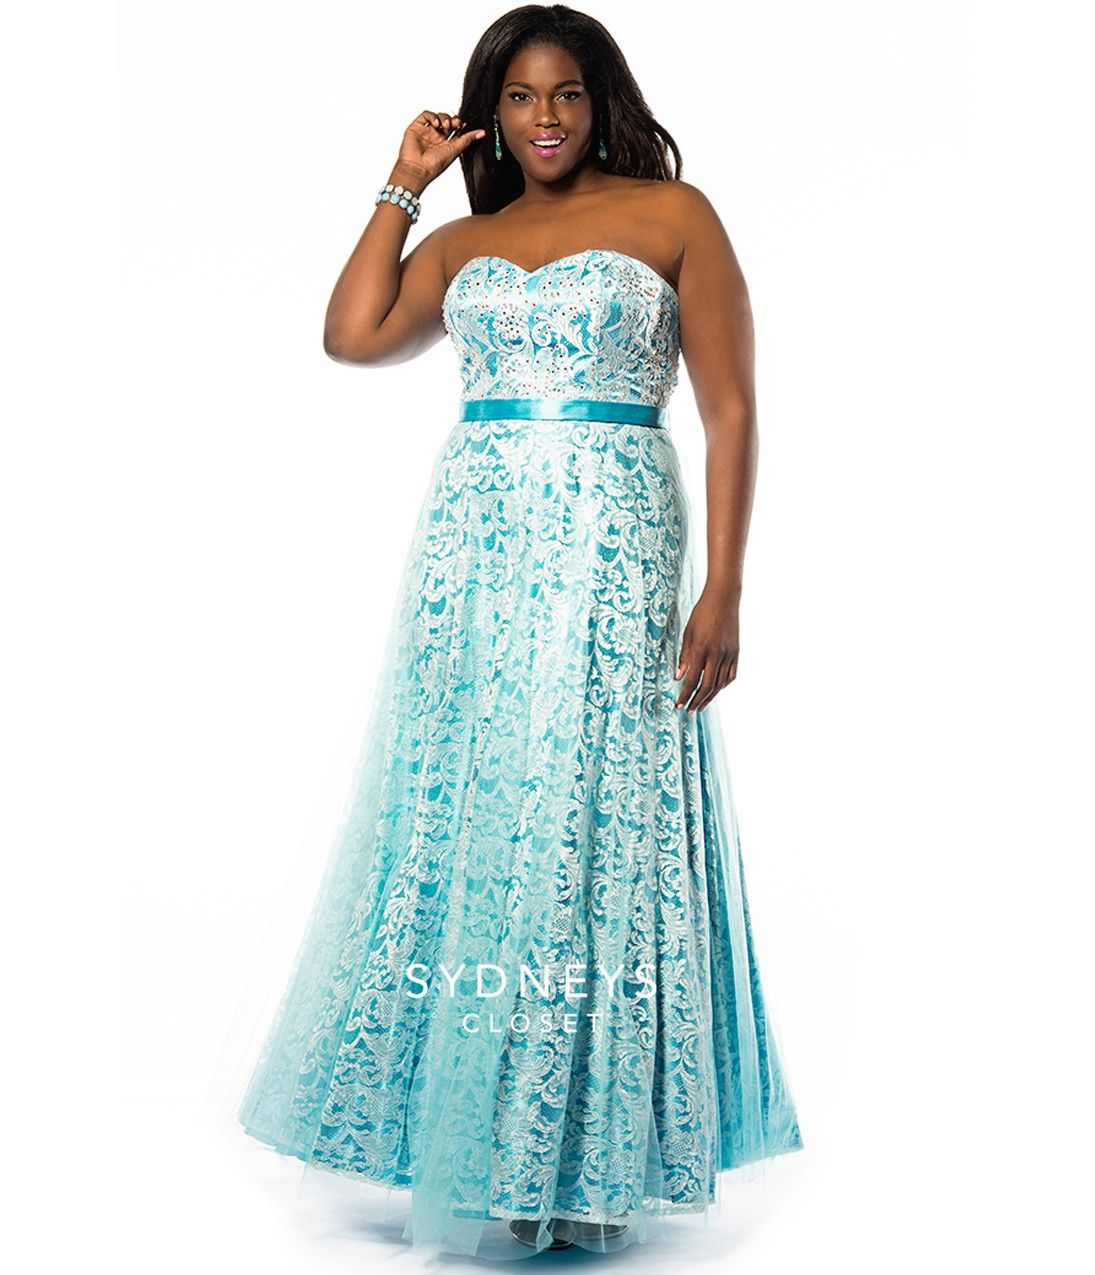 Crystal blue strapless sequin u lace gown plus size womenus